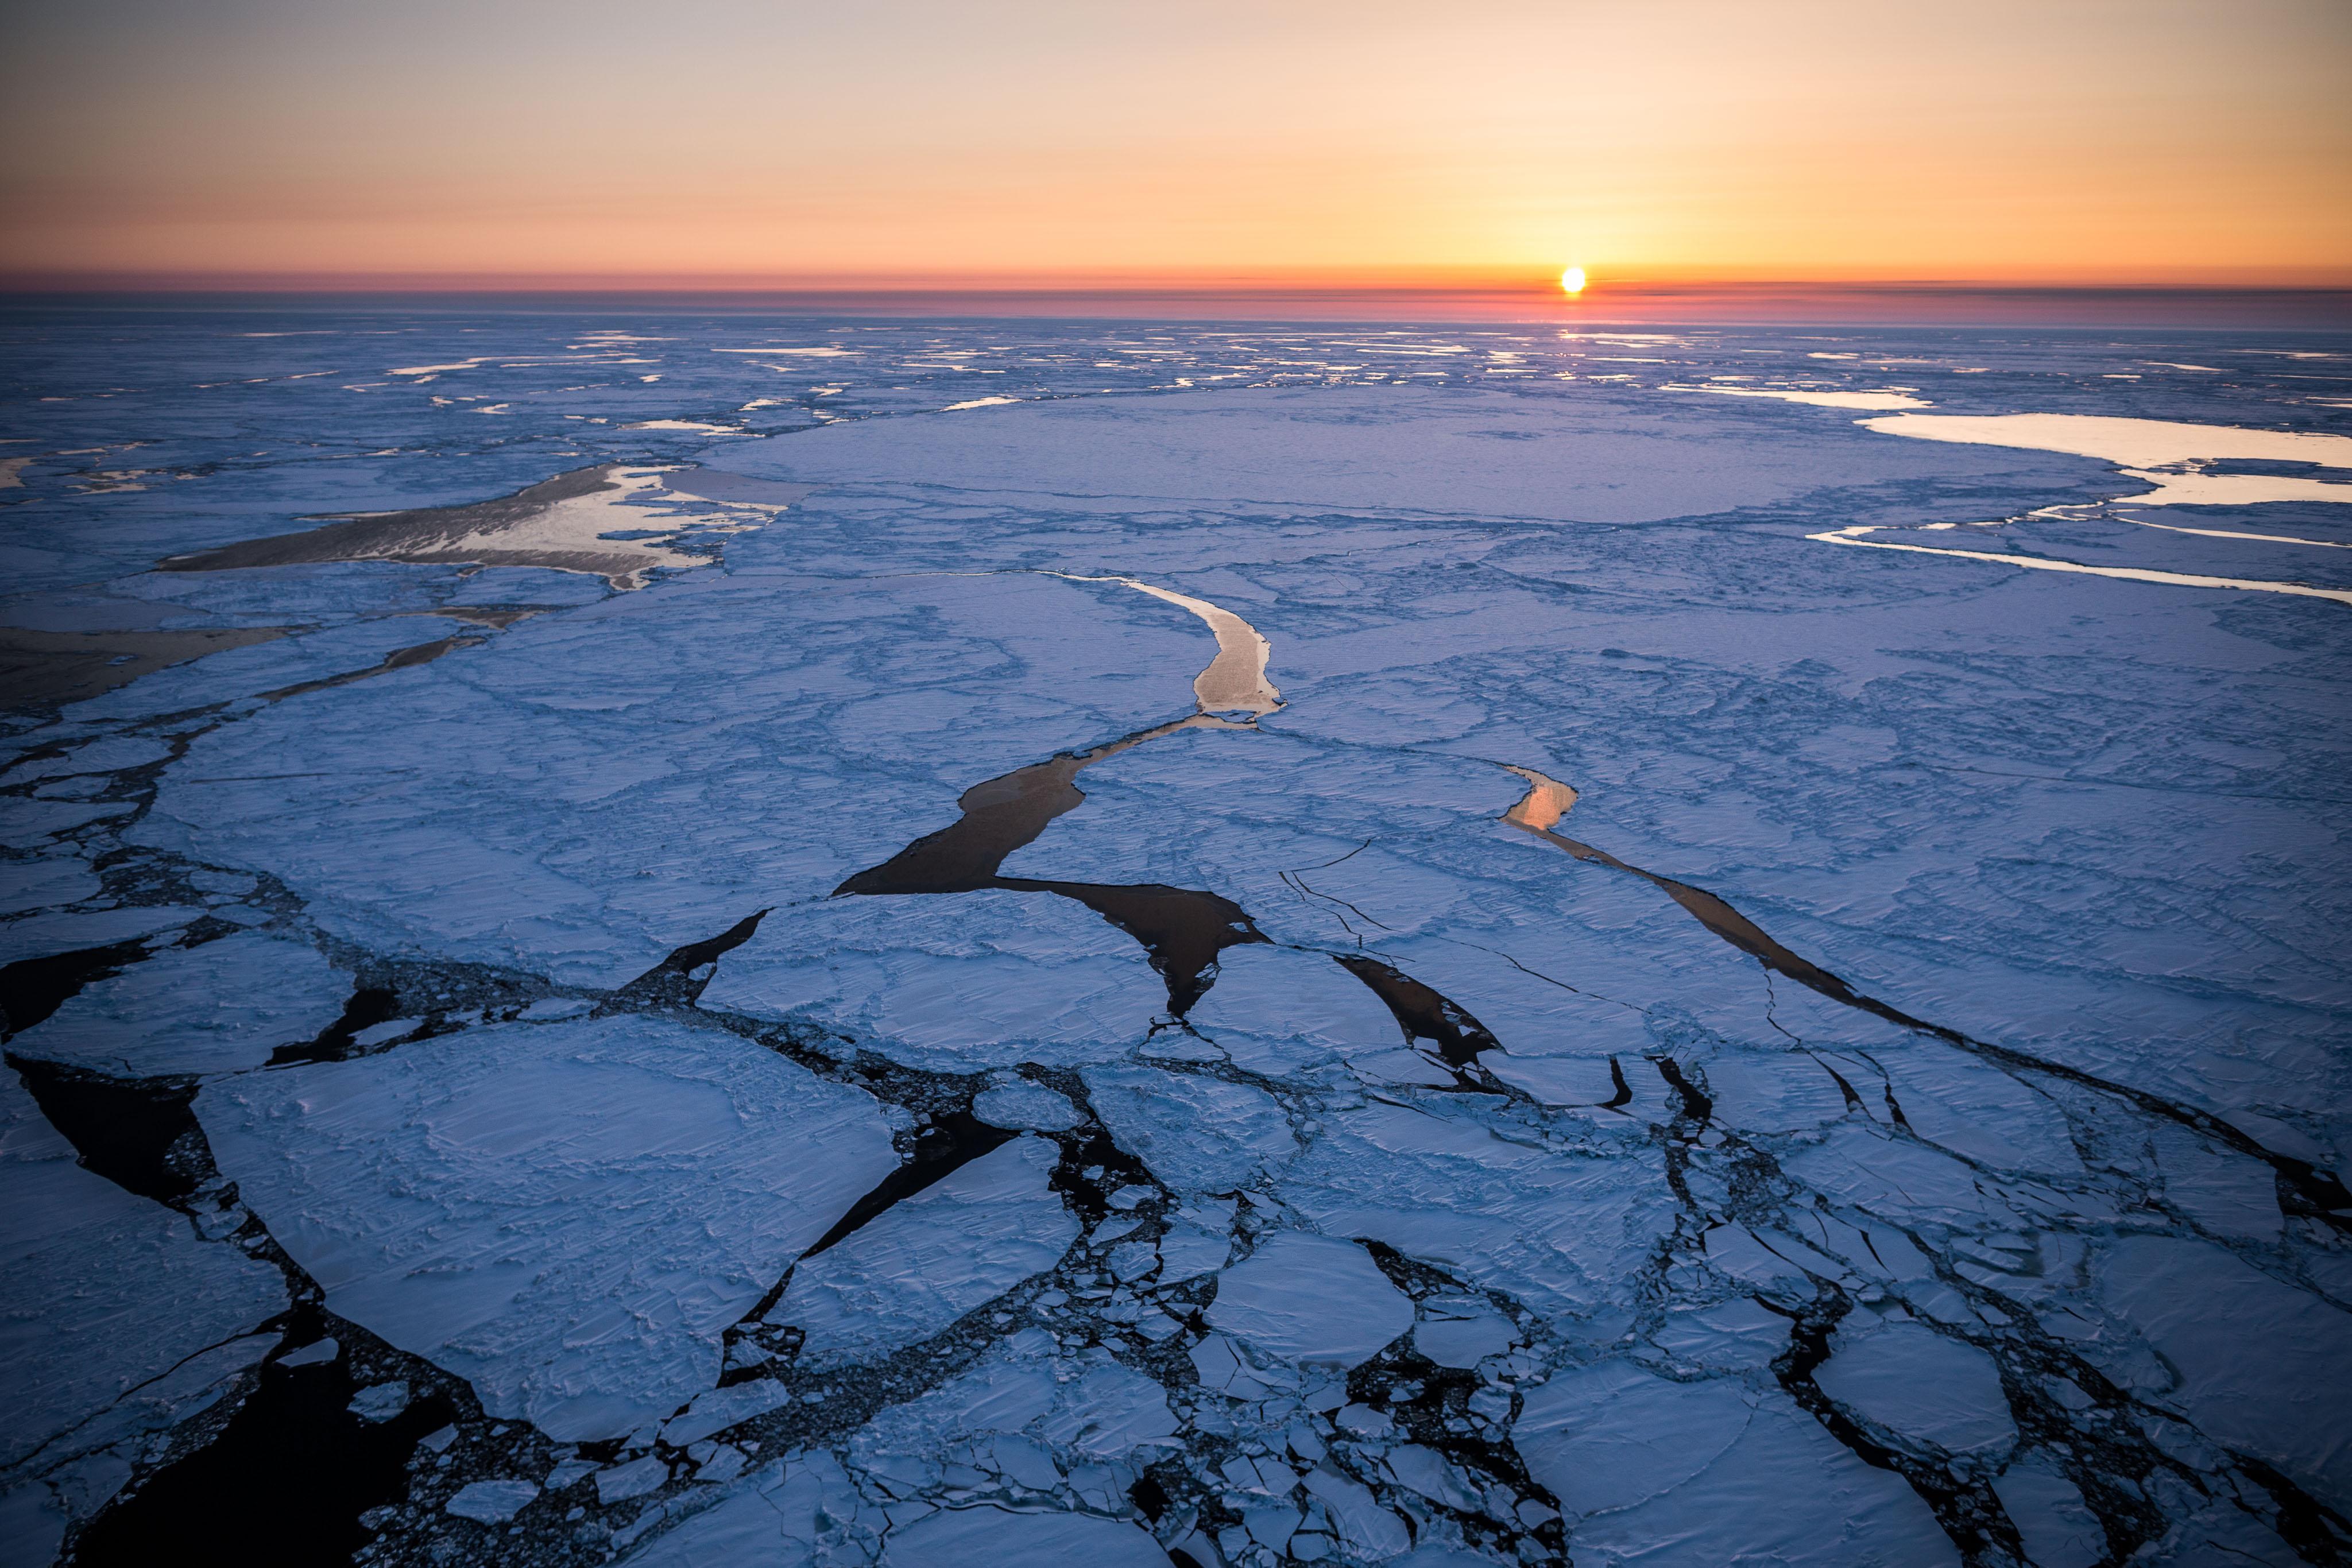 "64°55'29"" N 168°10'29"" W Bering Sea, March 13, 2013. (Loren Holmes / Alaska Dispatch News)"